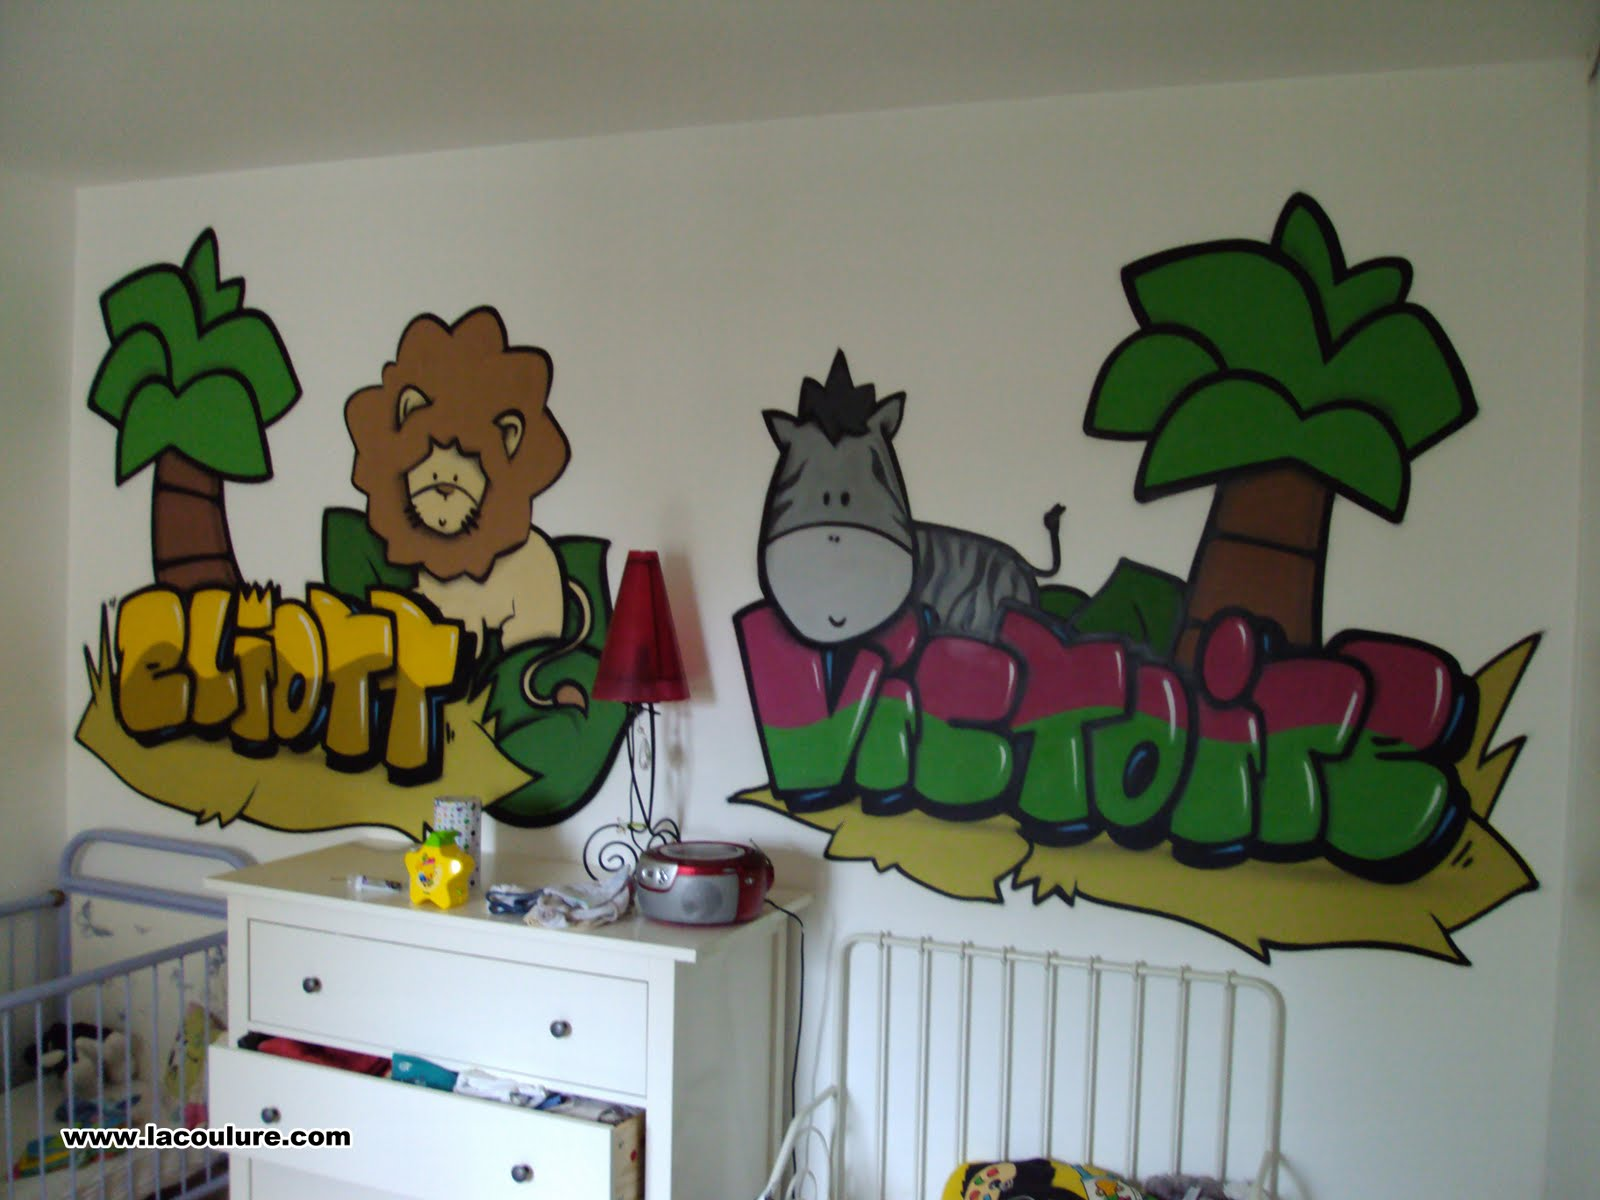 collectif la coulure graffiti lyon graff chambre d 39 enfant jungle. Black Bedroom Furniture Sets. Home Design Ideas